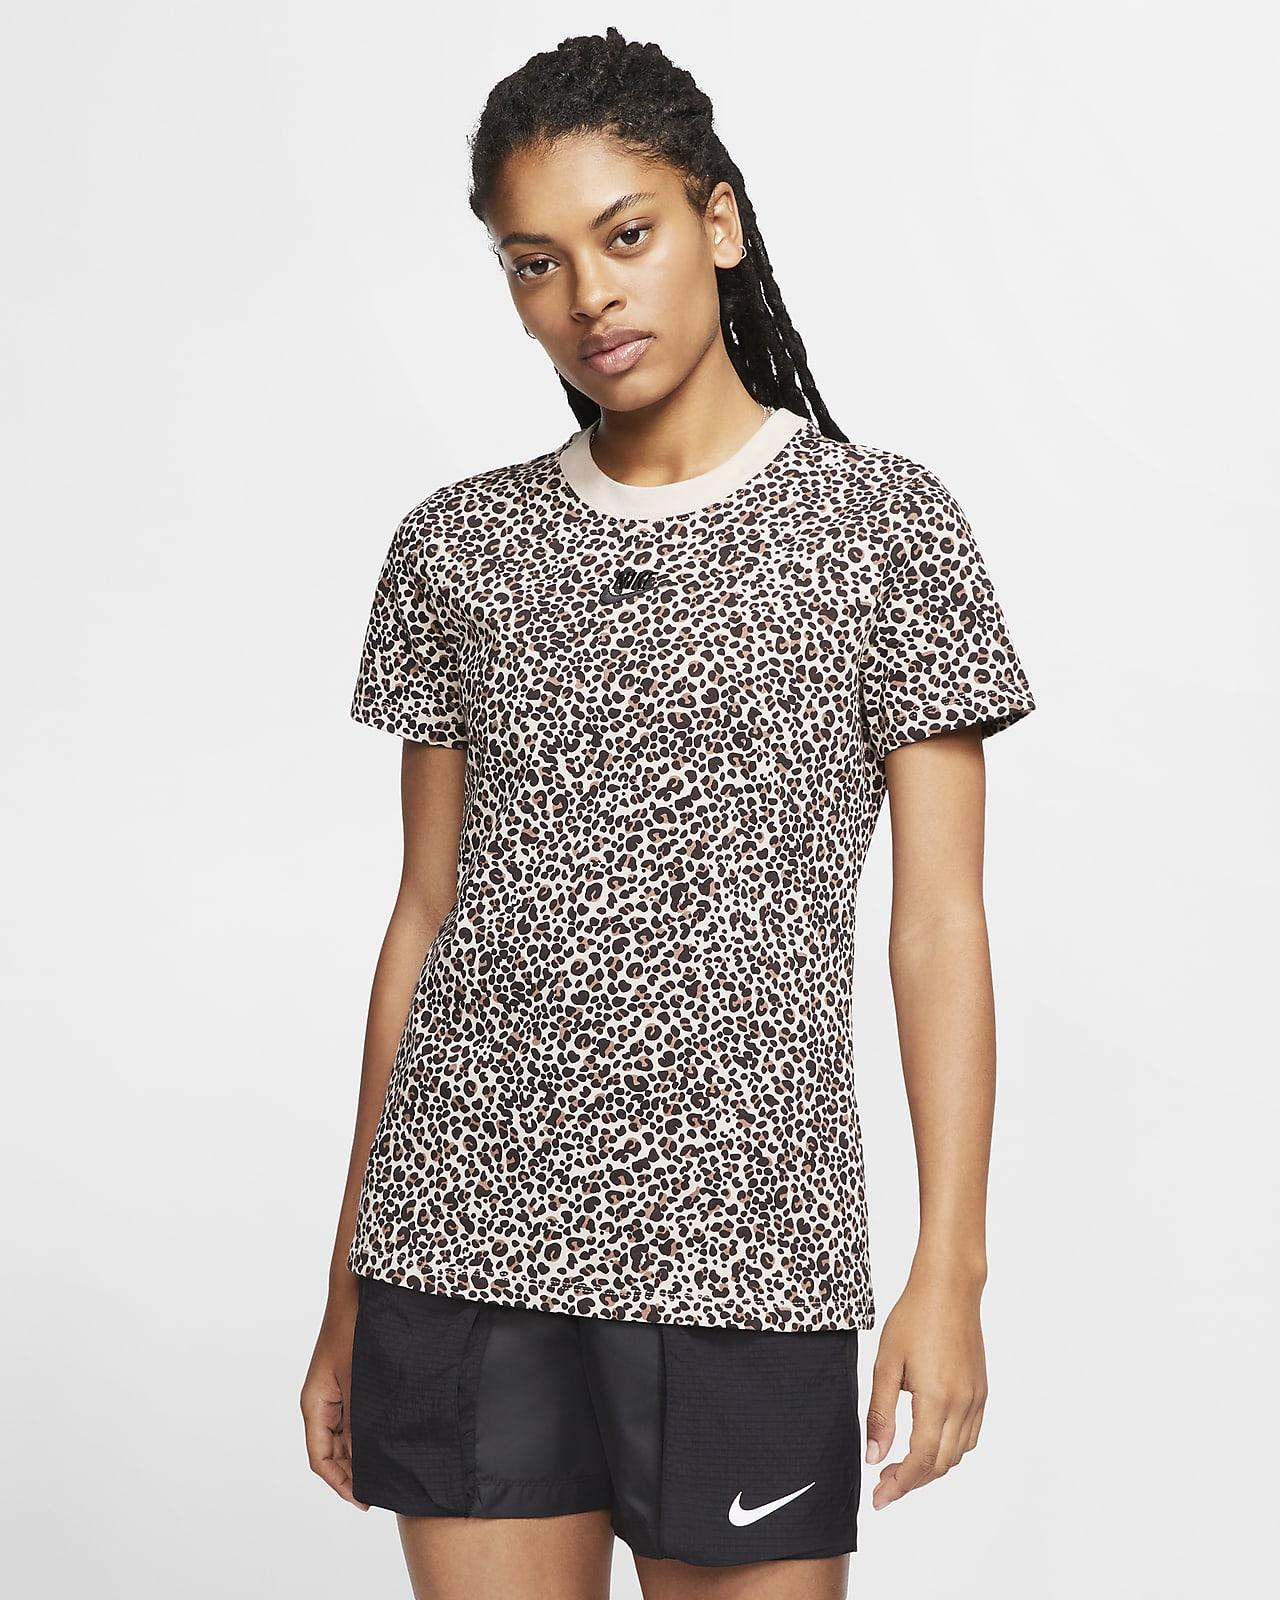 Tee-shirt avec imprimé animal Nike Sportswear pour Femme